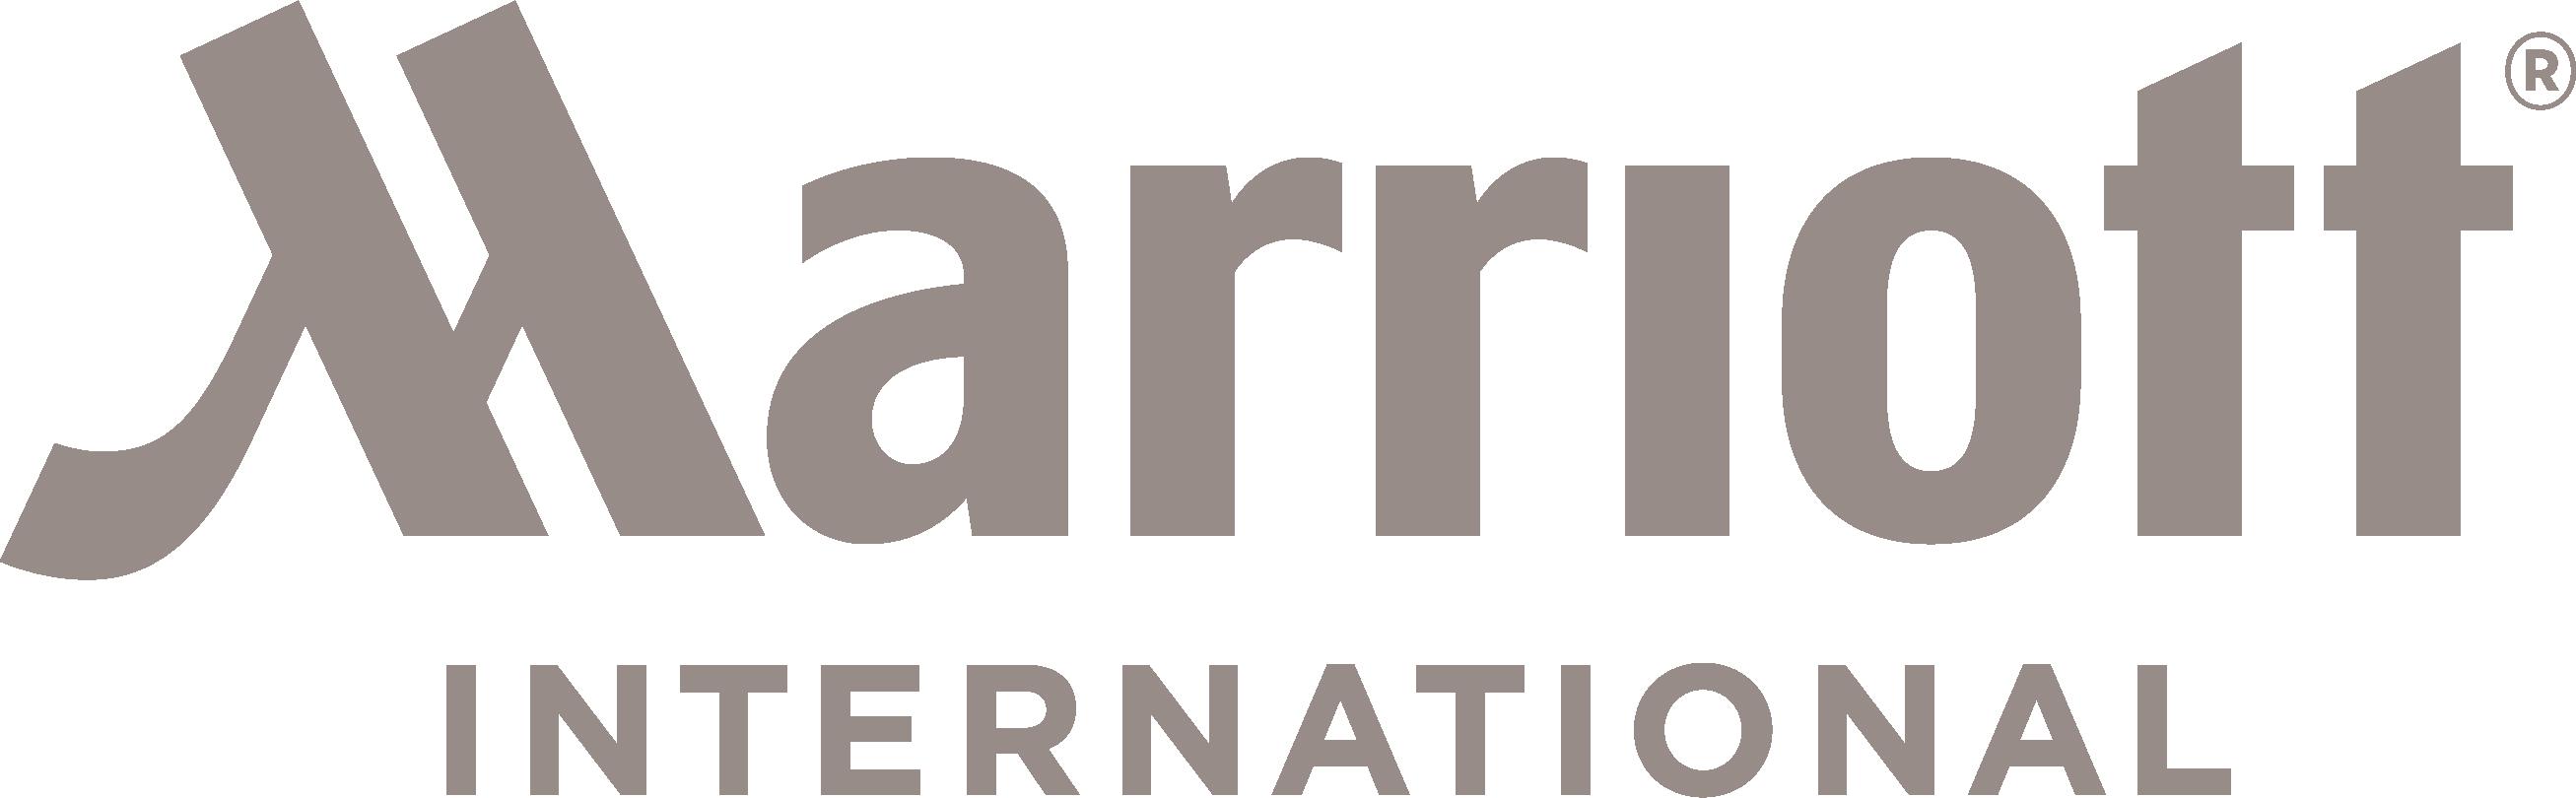 Marriott_March 2019